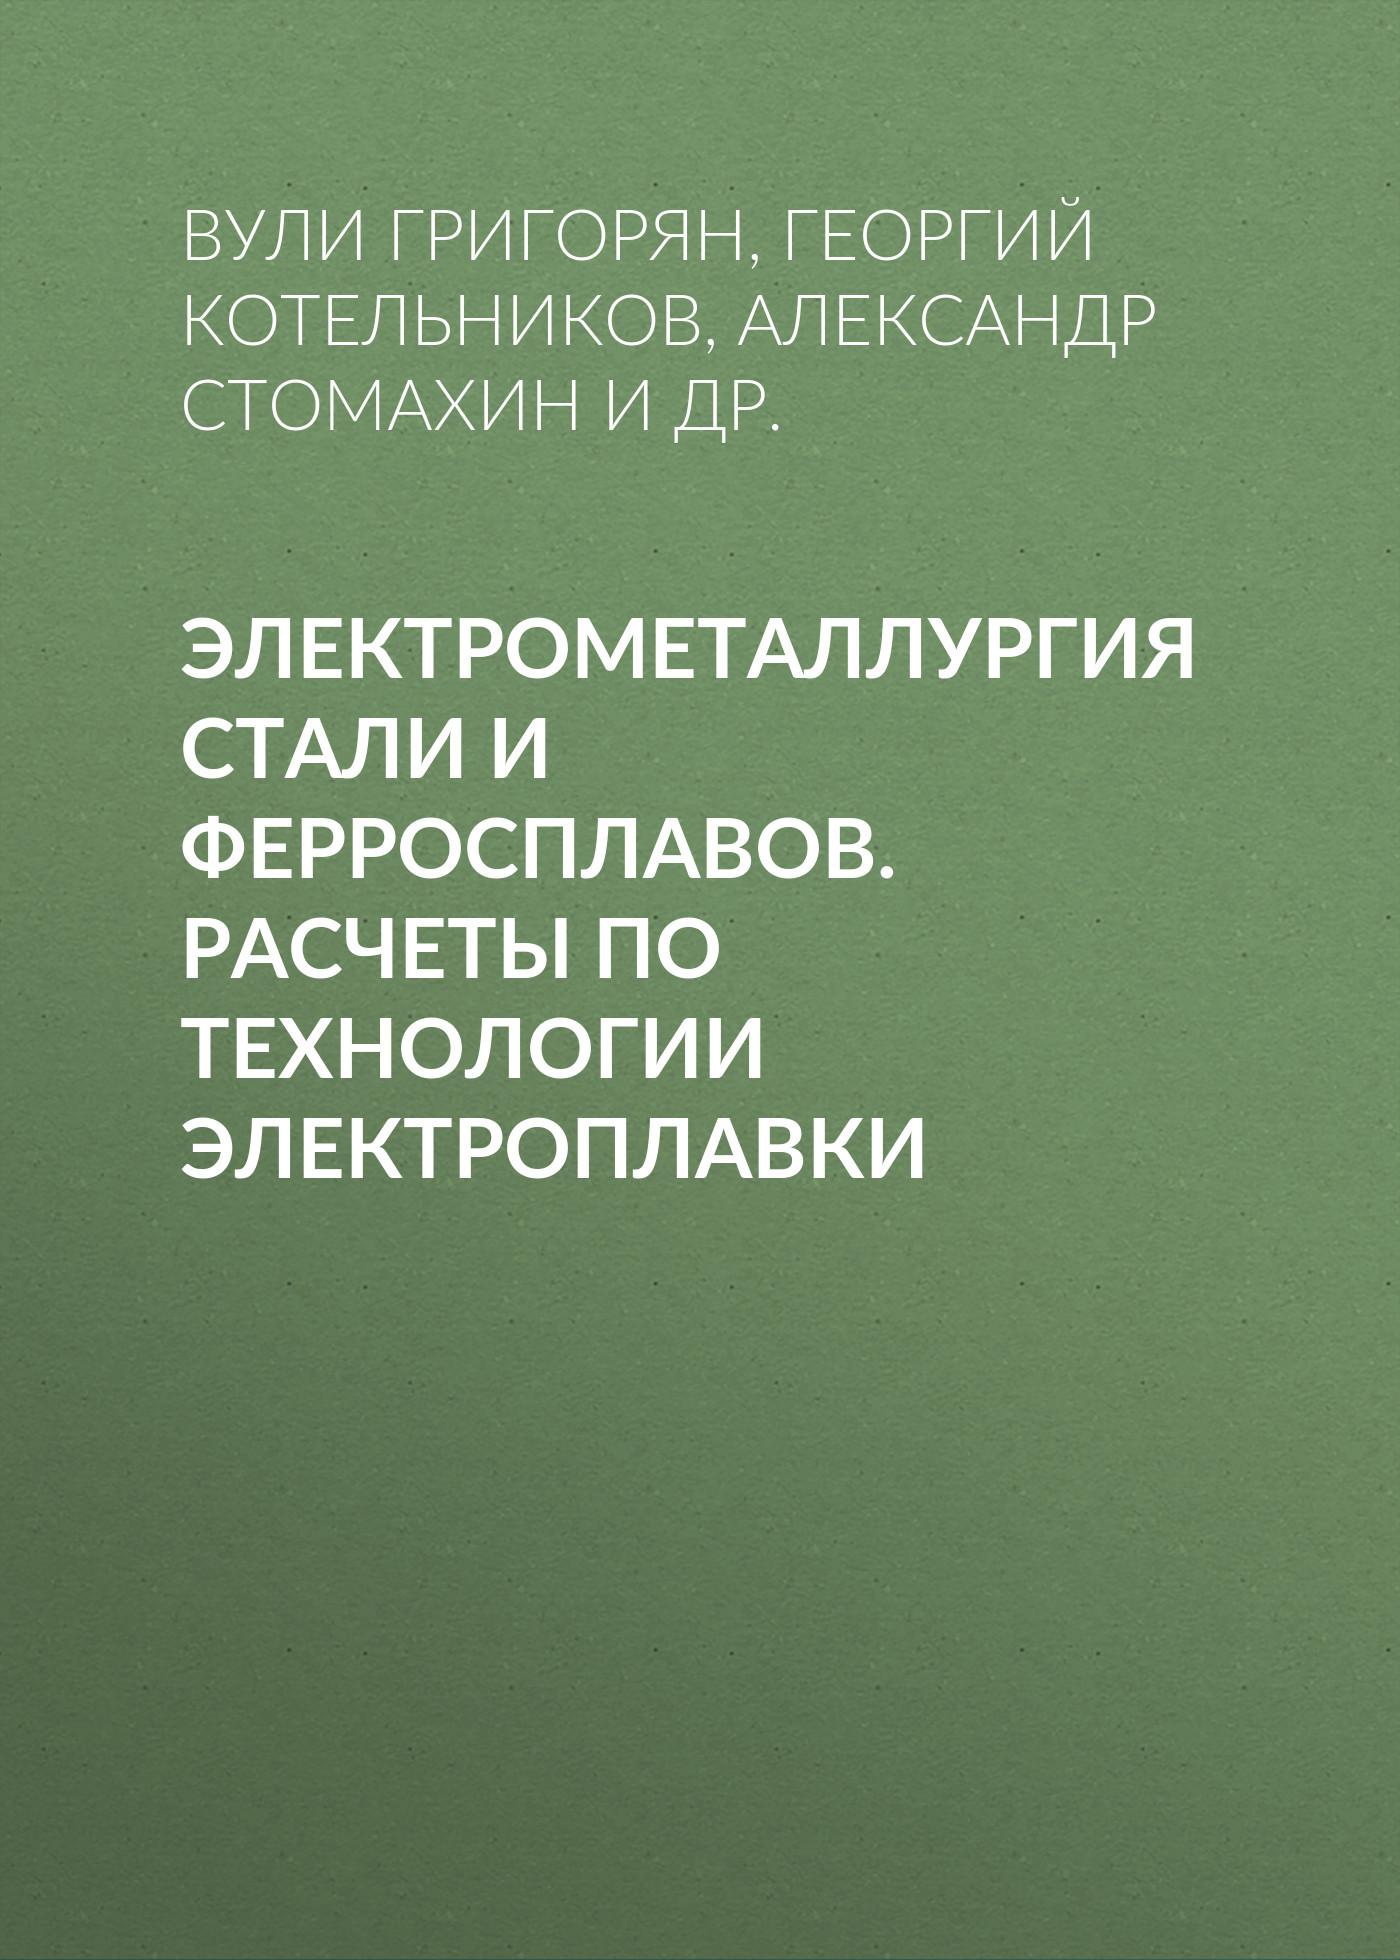 Александр Стомахин Электрометаллургия стали и ферросплавов. Расчеты по технологии электроплавки